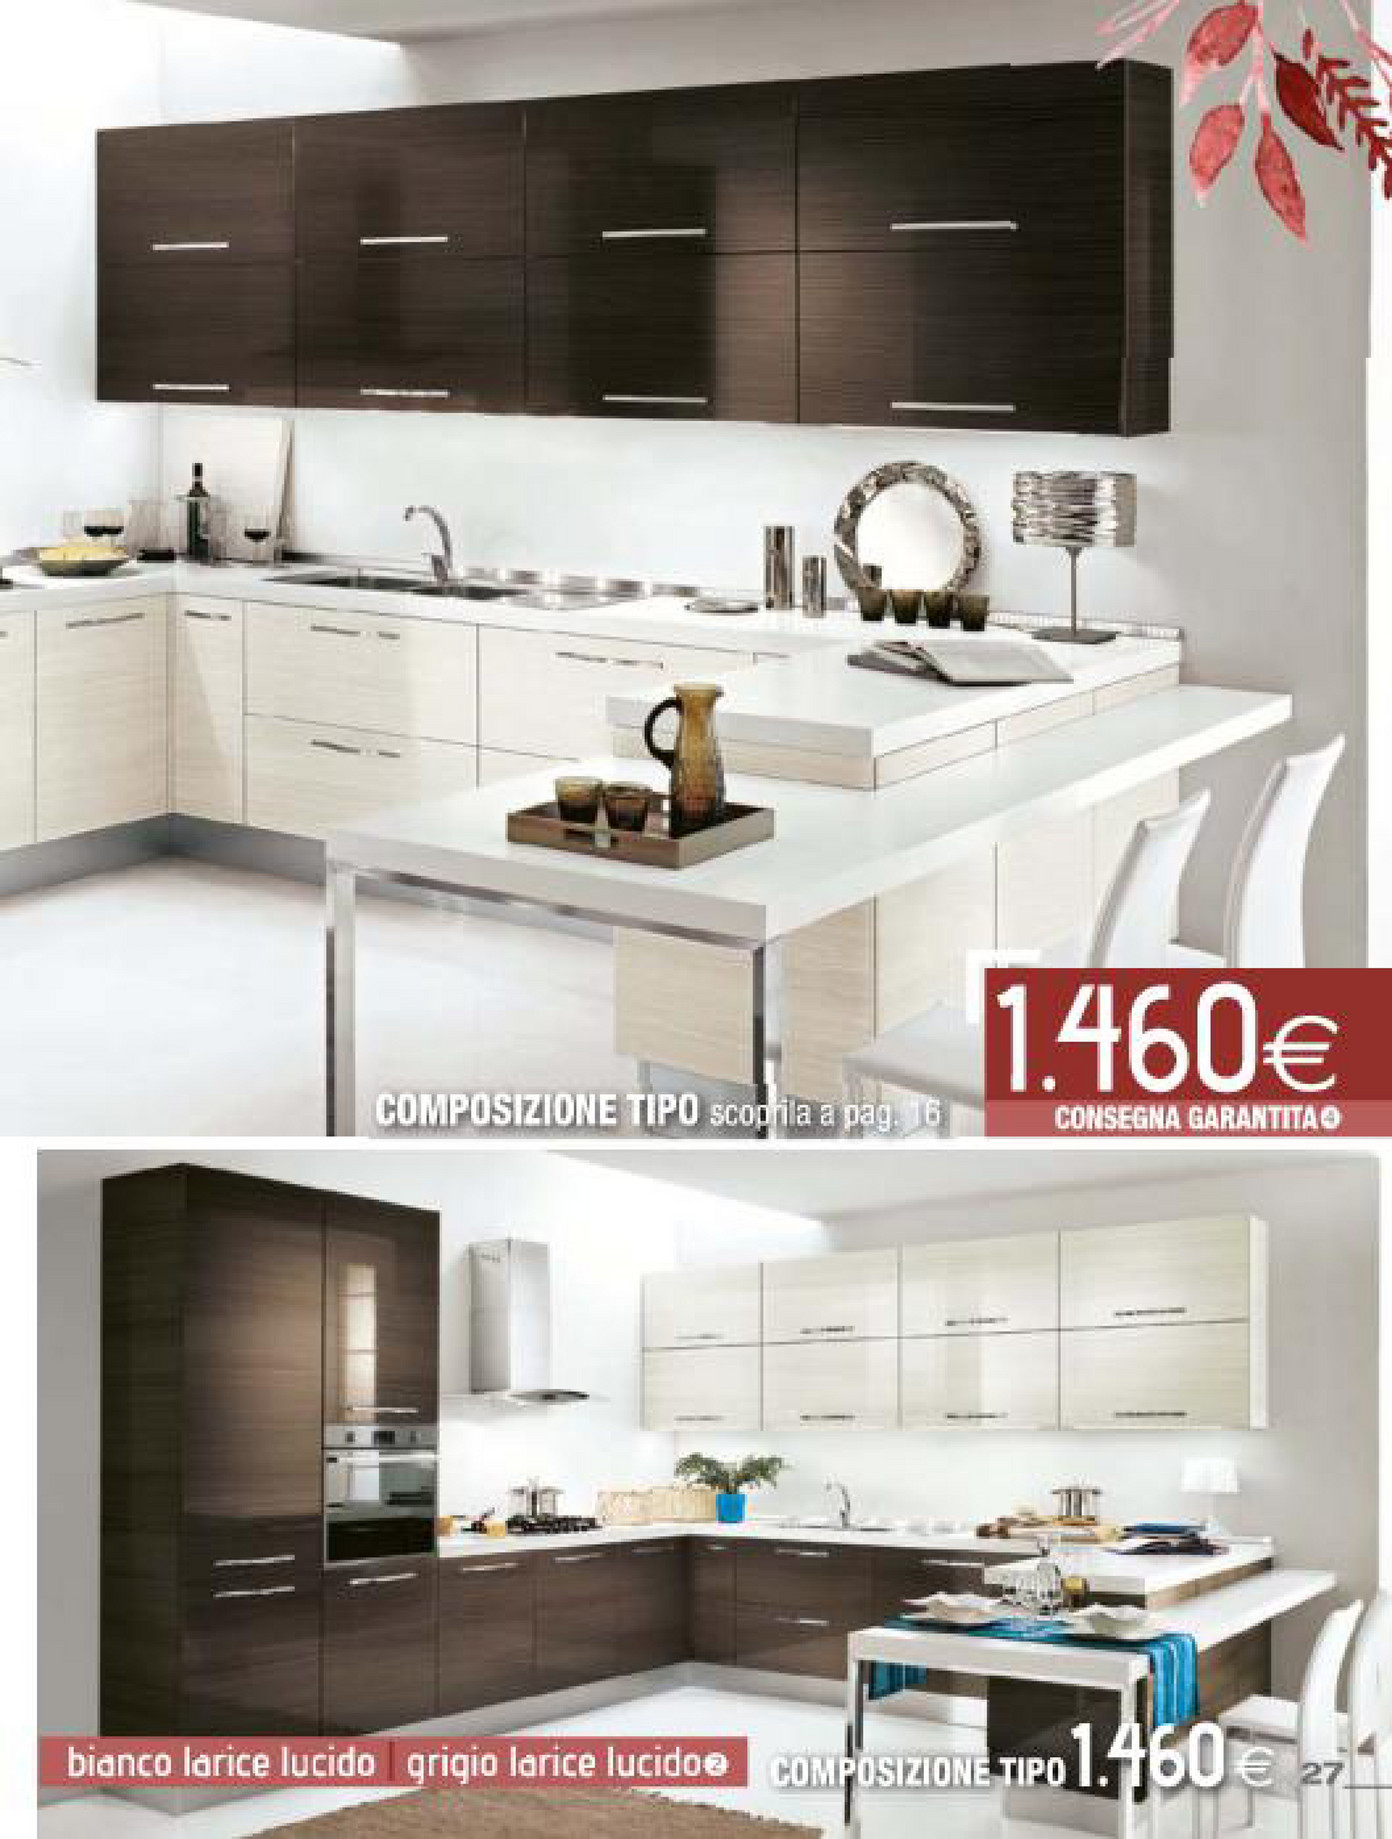 VolantinoFacile - Catalogo Mondo Convenienza Cucine 2016 - Pagina ...